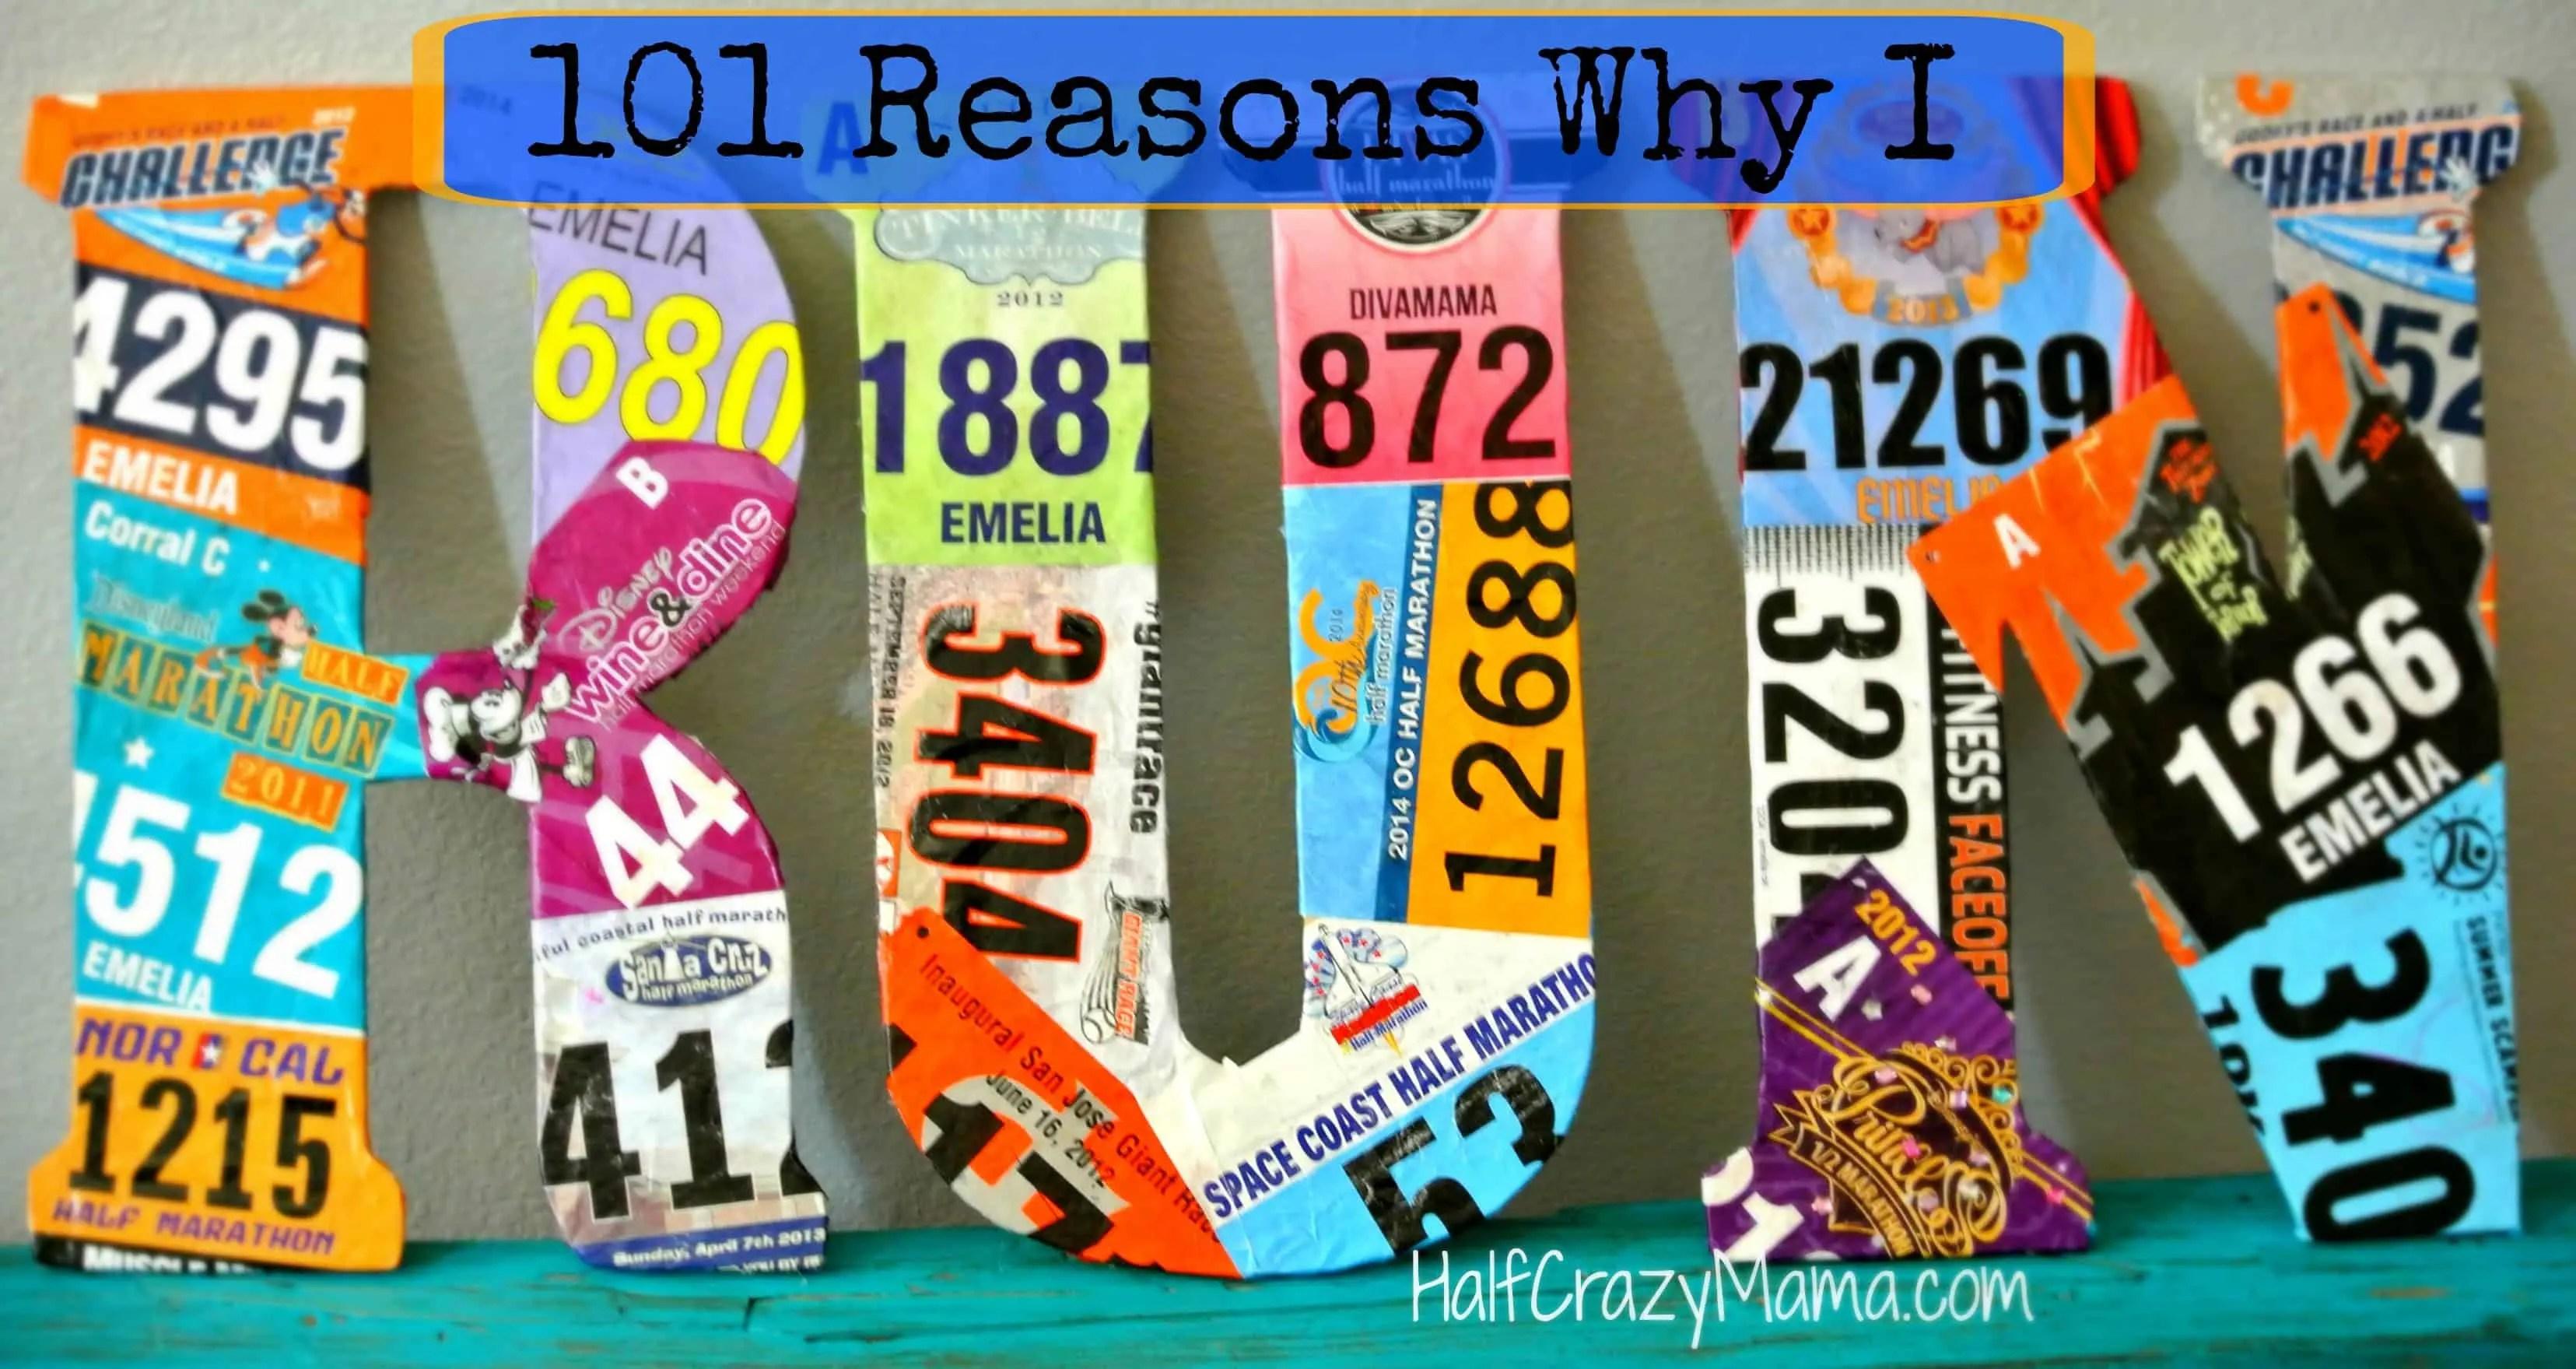 101 Reasons Why I run